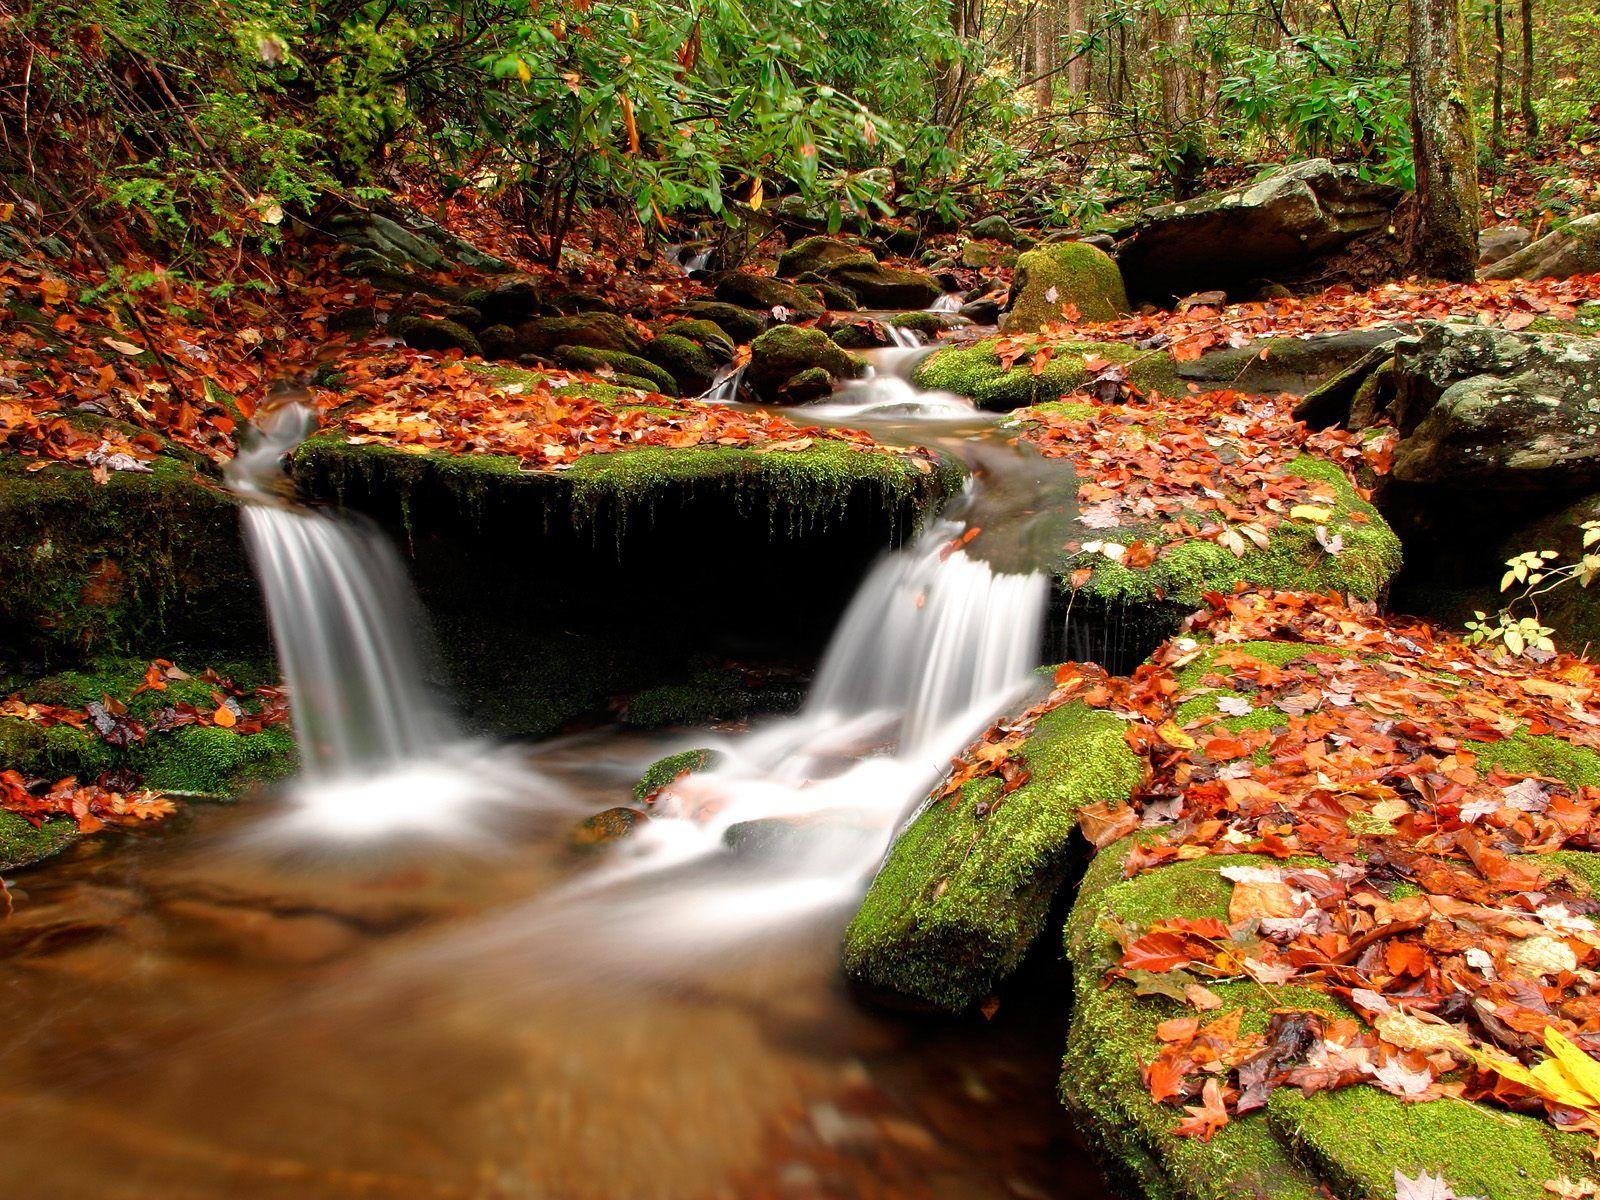 Fond ecran chute d eau for Site fond ecran